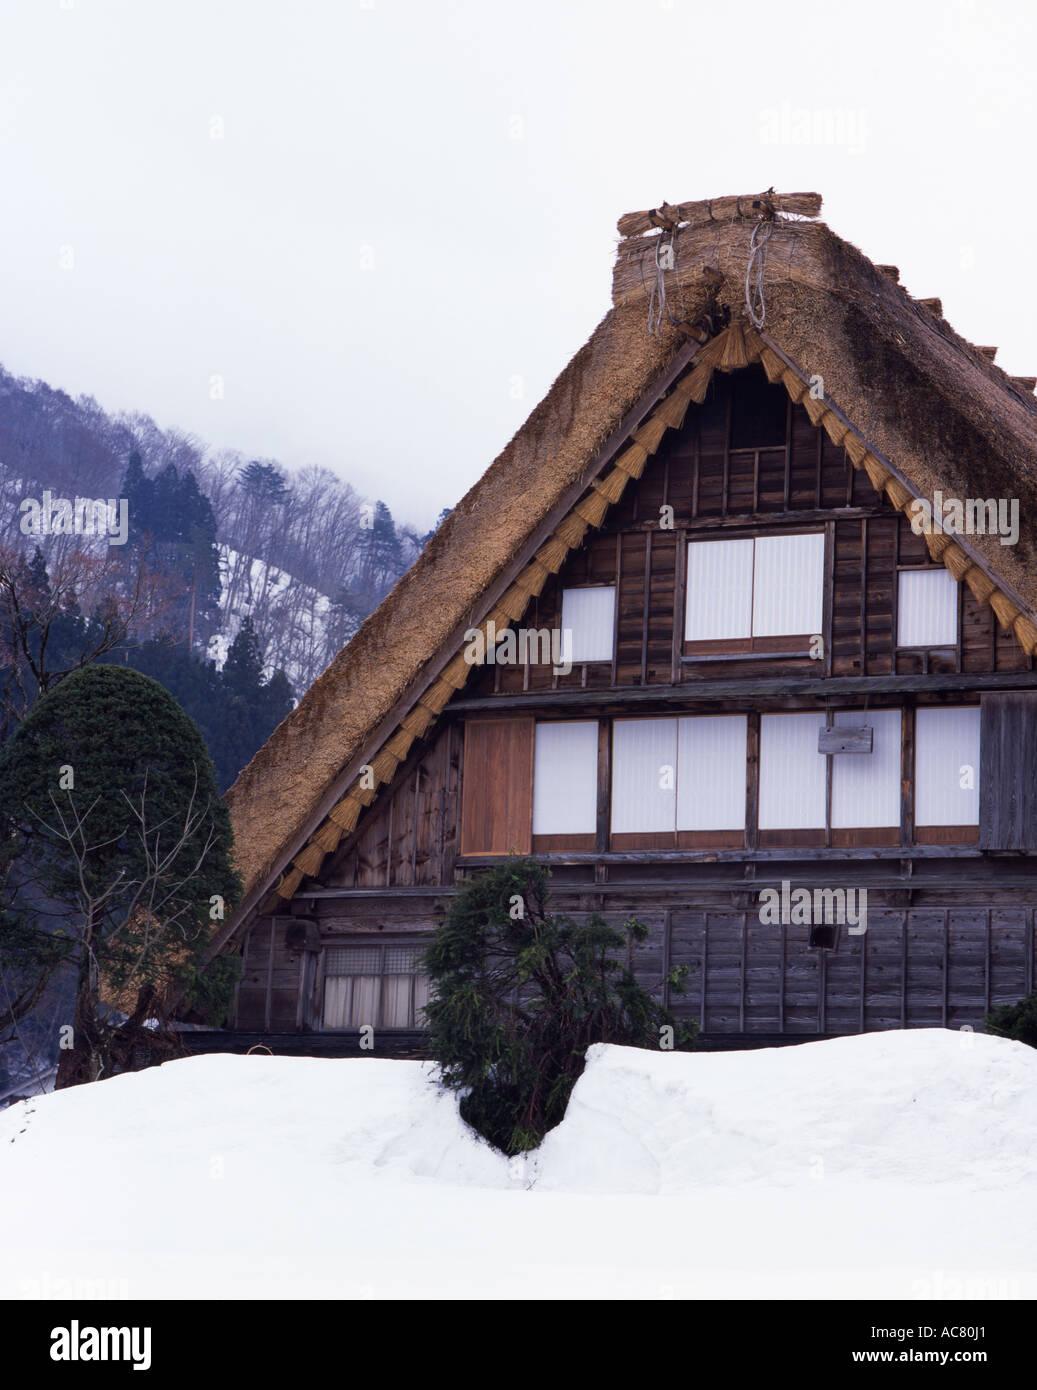 Shirakawa-go UNESCO world heritage site. Gassho-zukuri traditional thatched houses - Stock Image